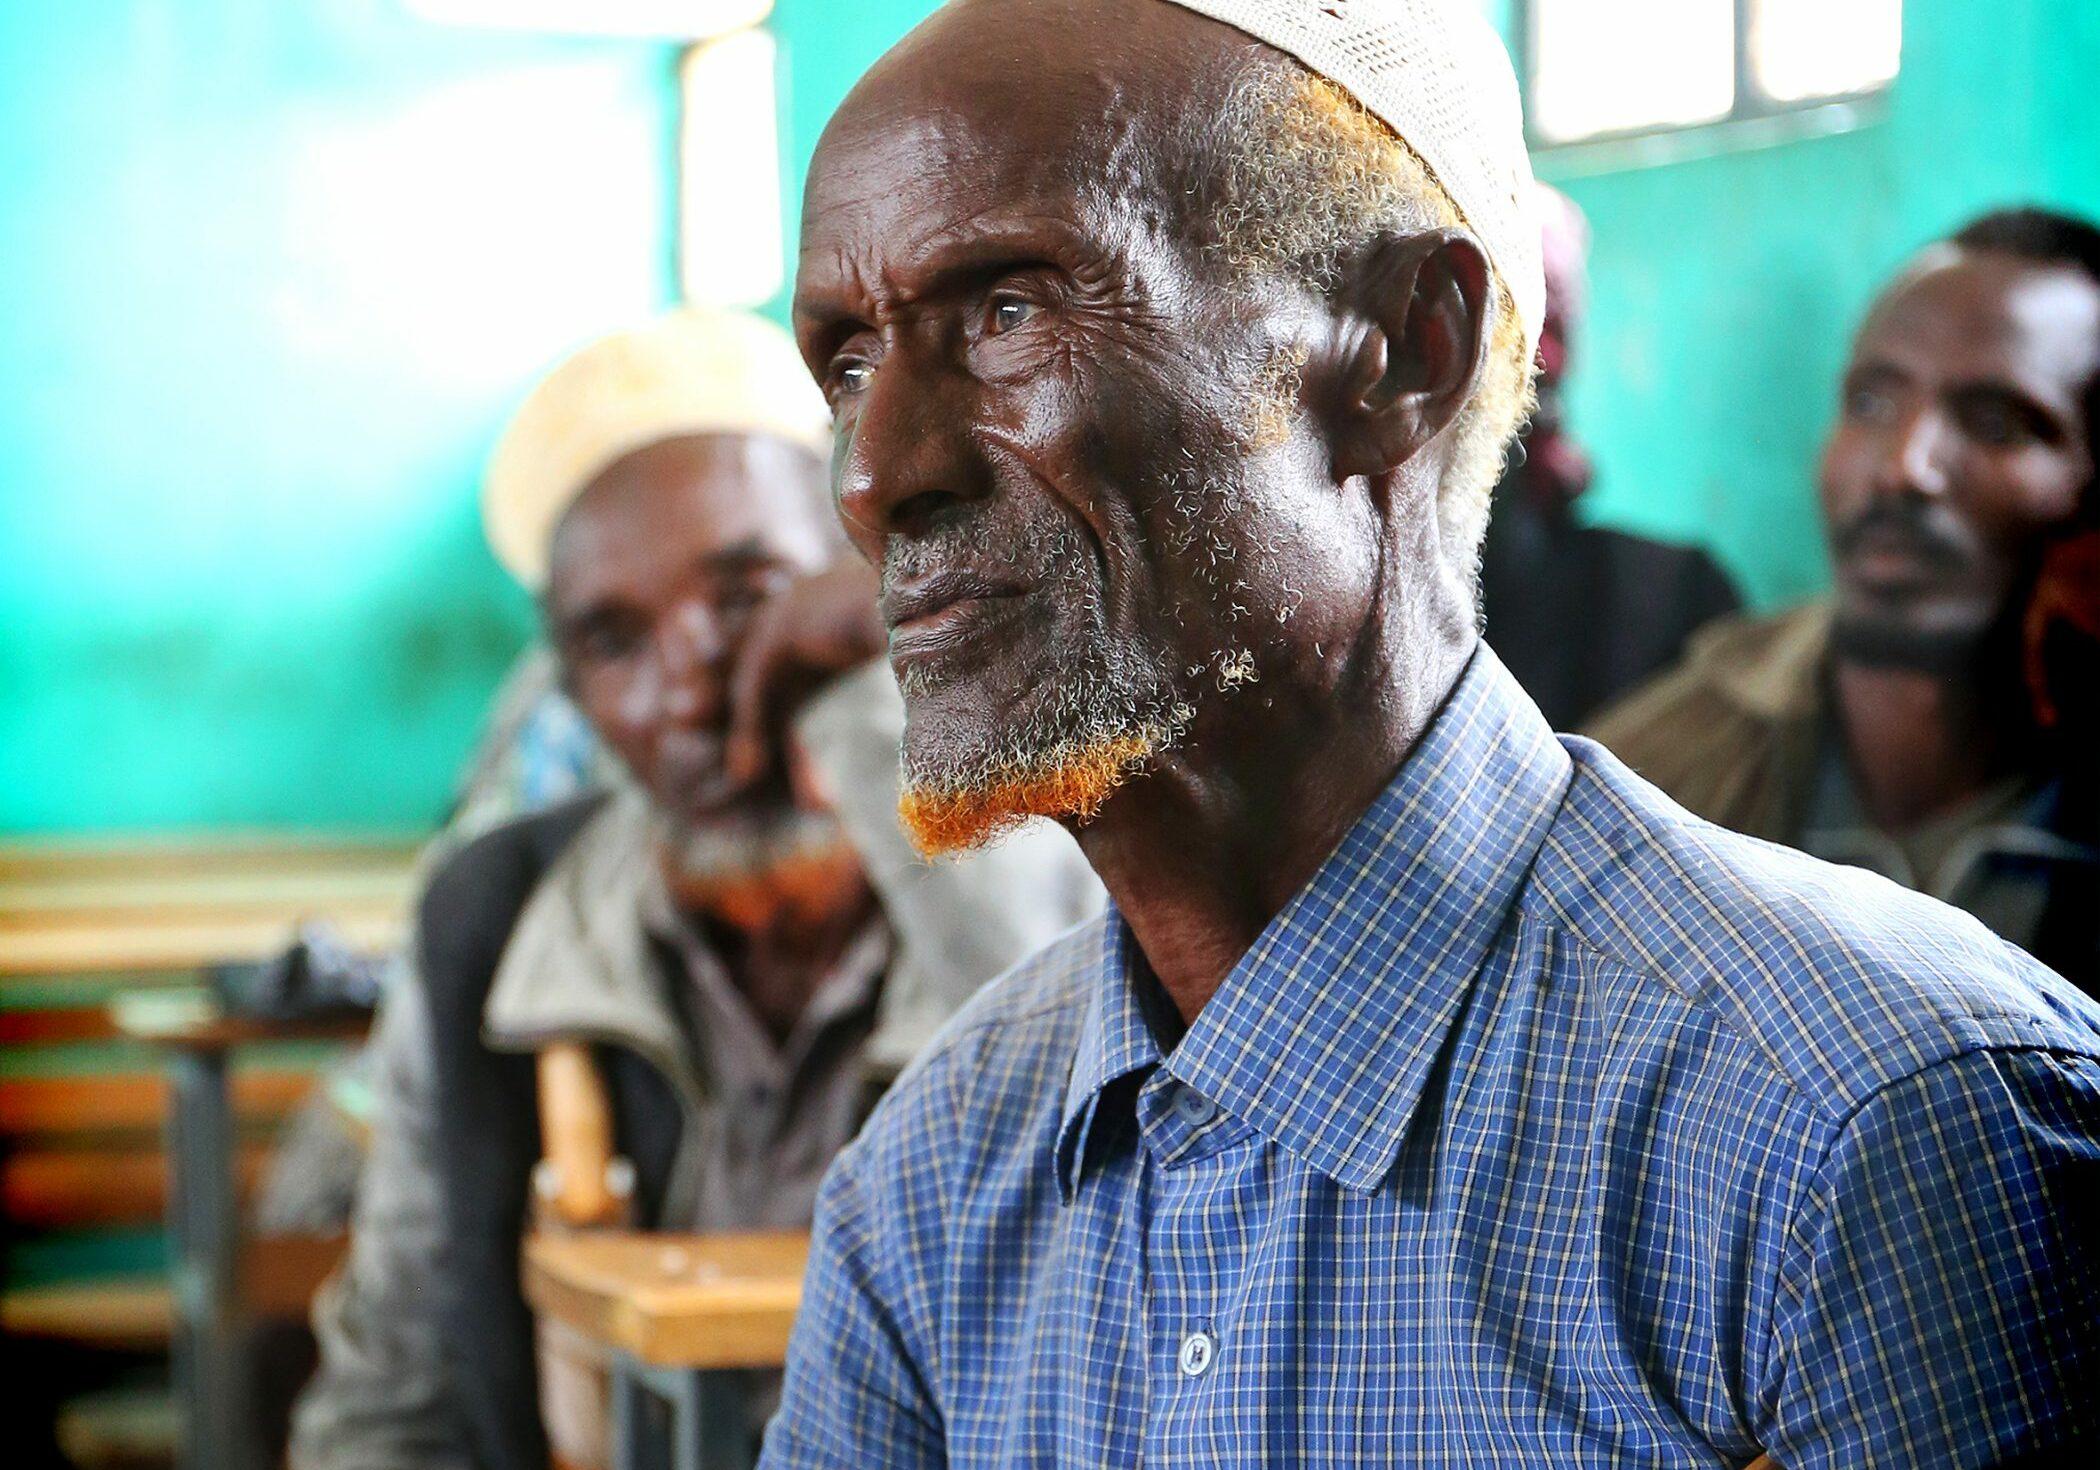 Alaki droogte Ethiopië